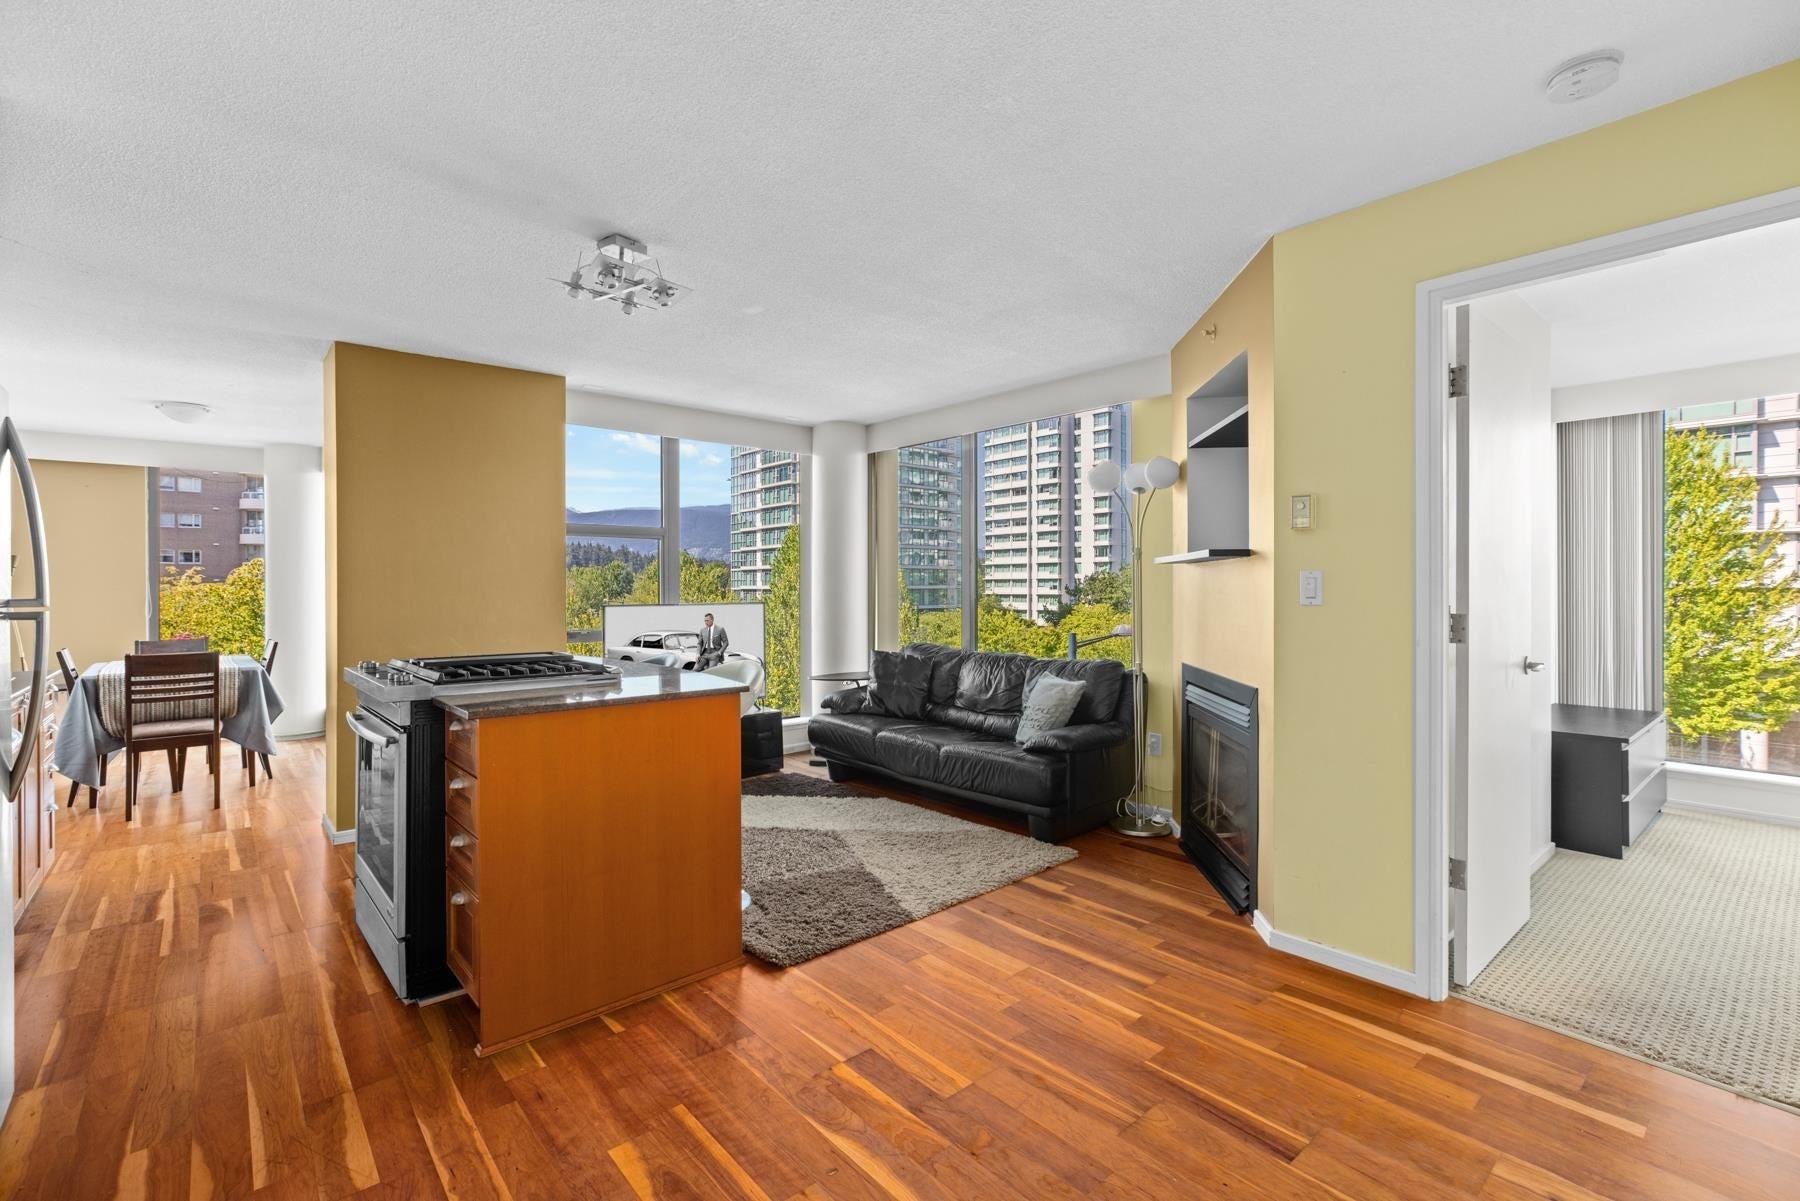 406 1723 ALBERNI STREET - West End VW Apartment/Condo for sale, 1 Bedroom (R2600785) - #1